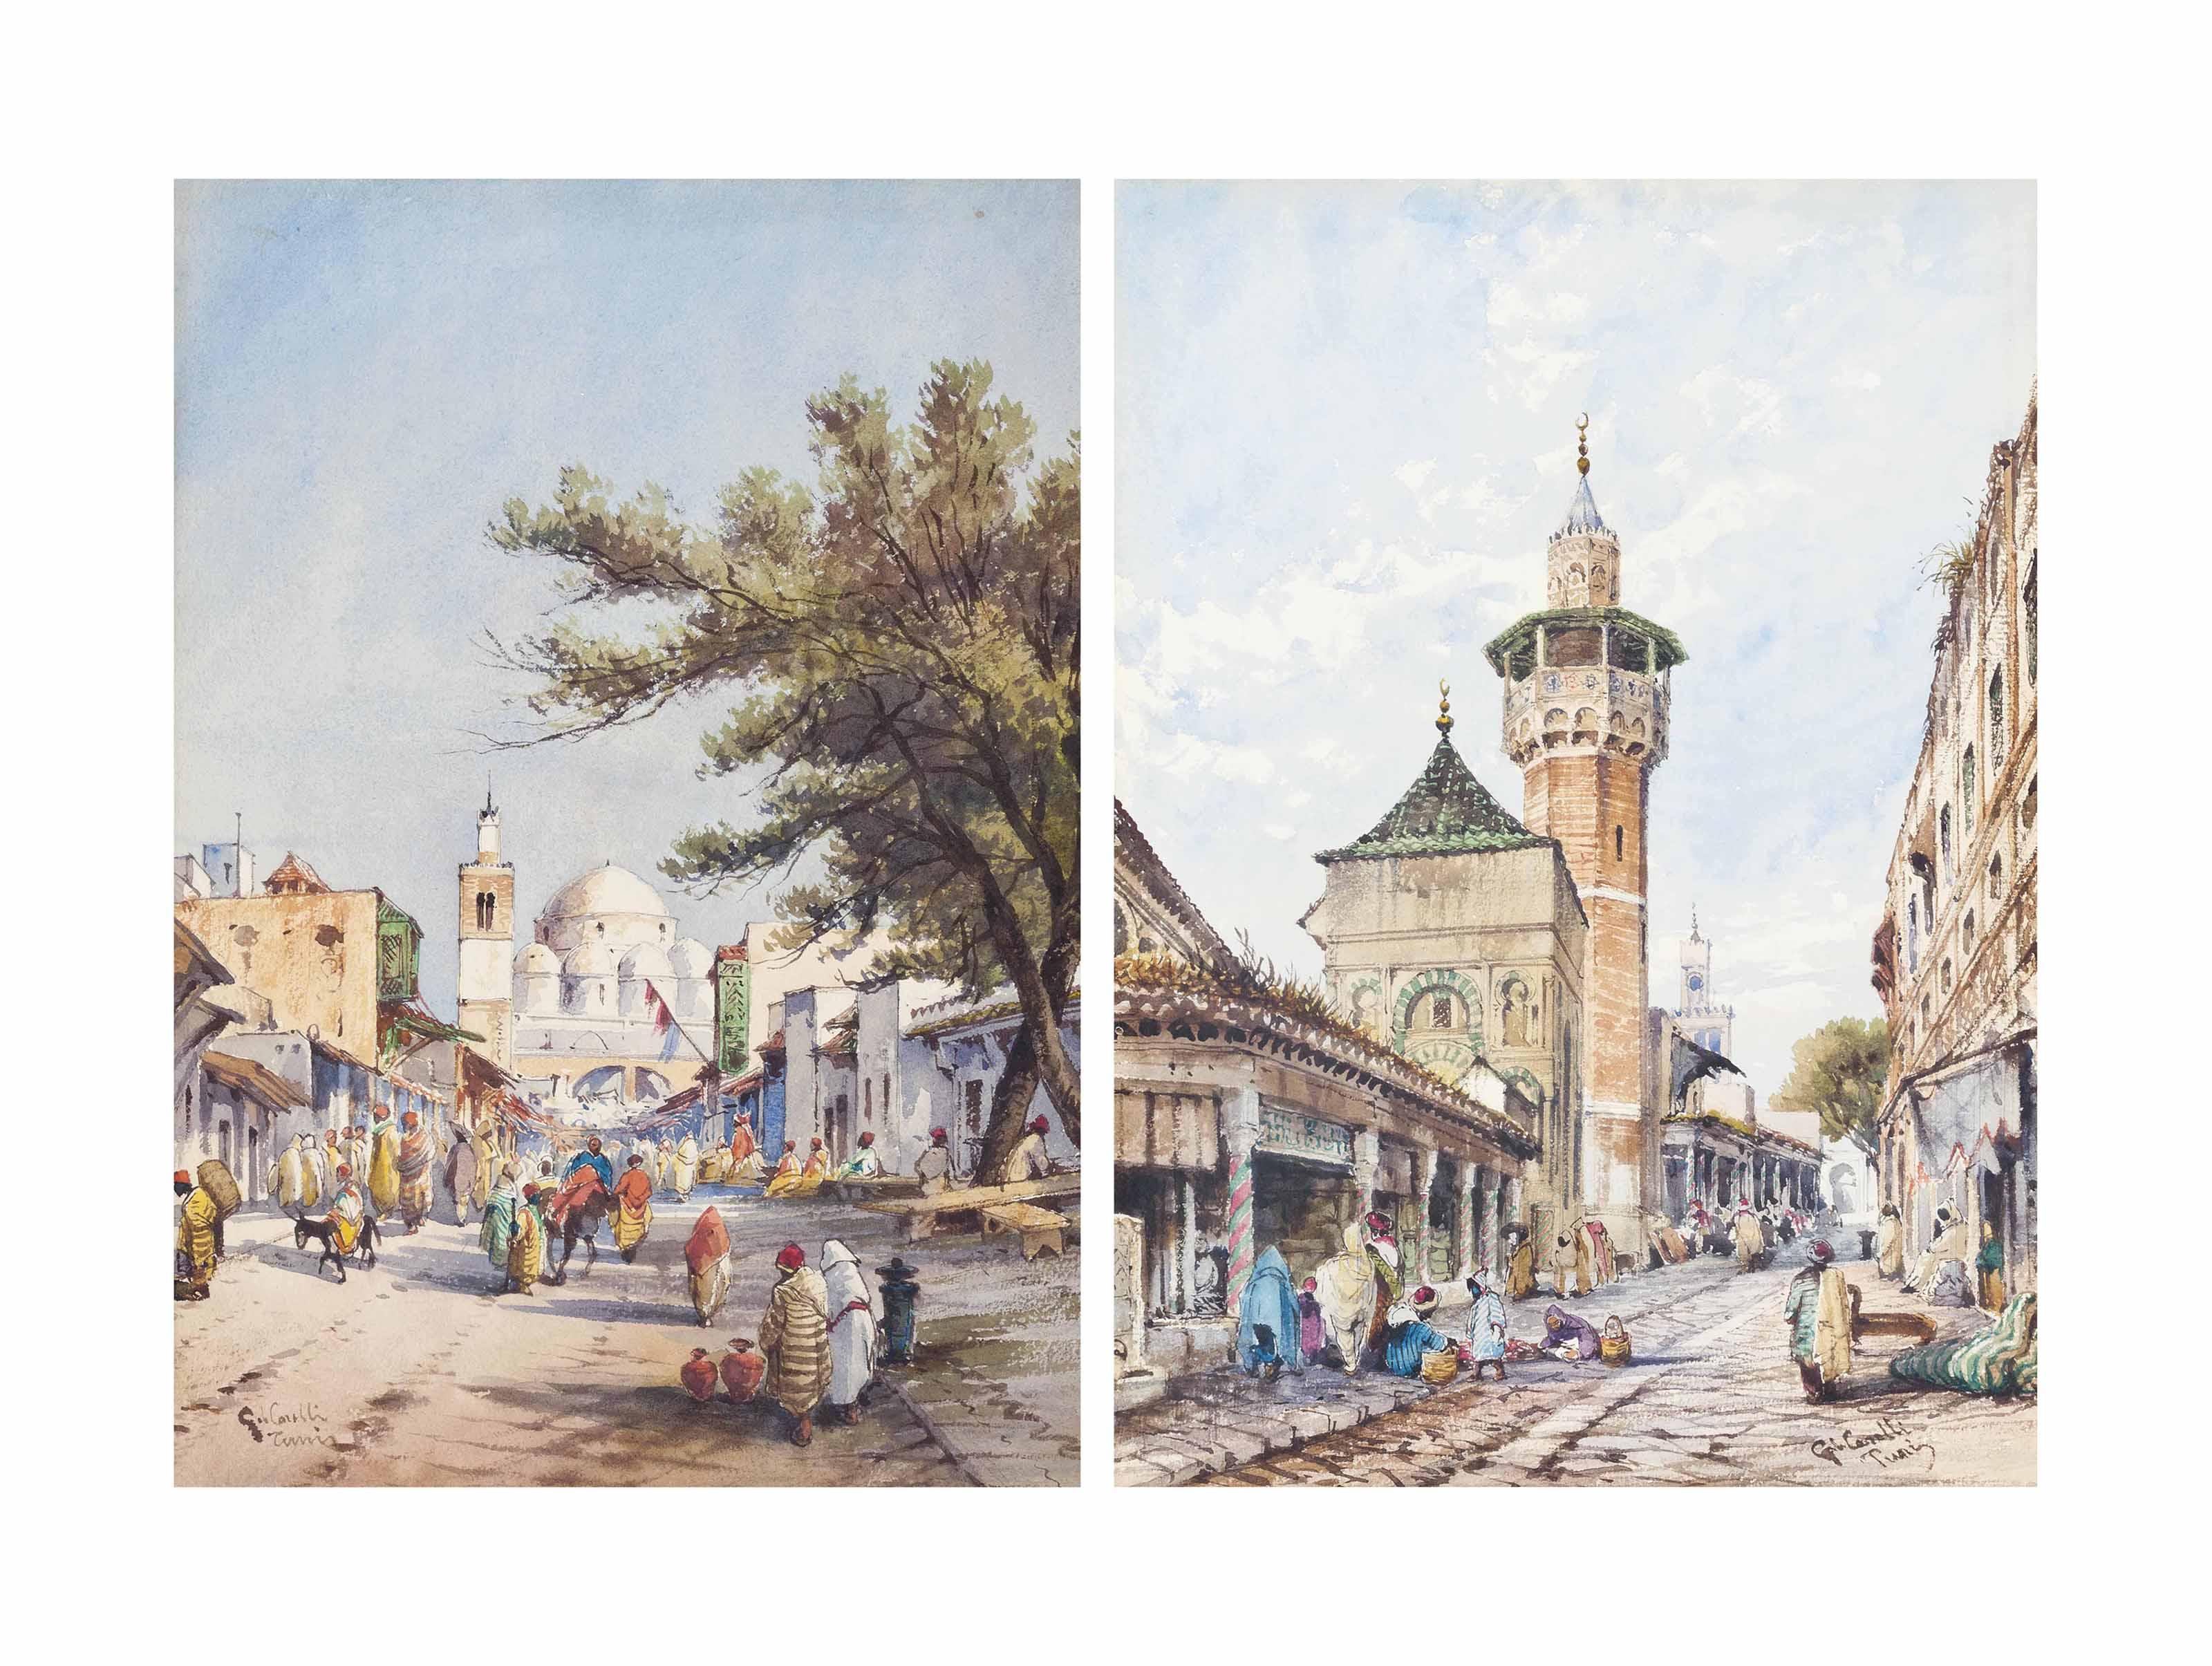 Street scenes in Tunis